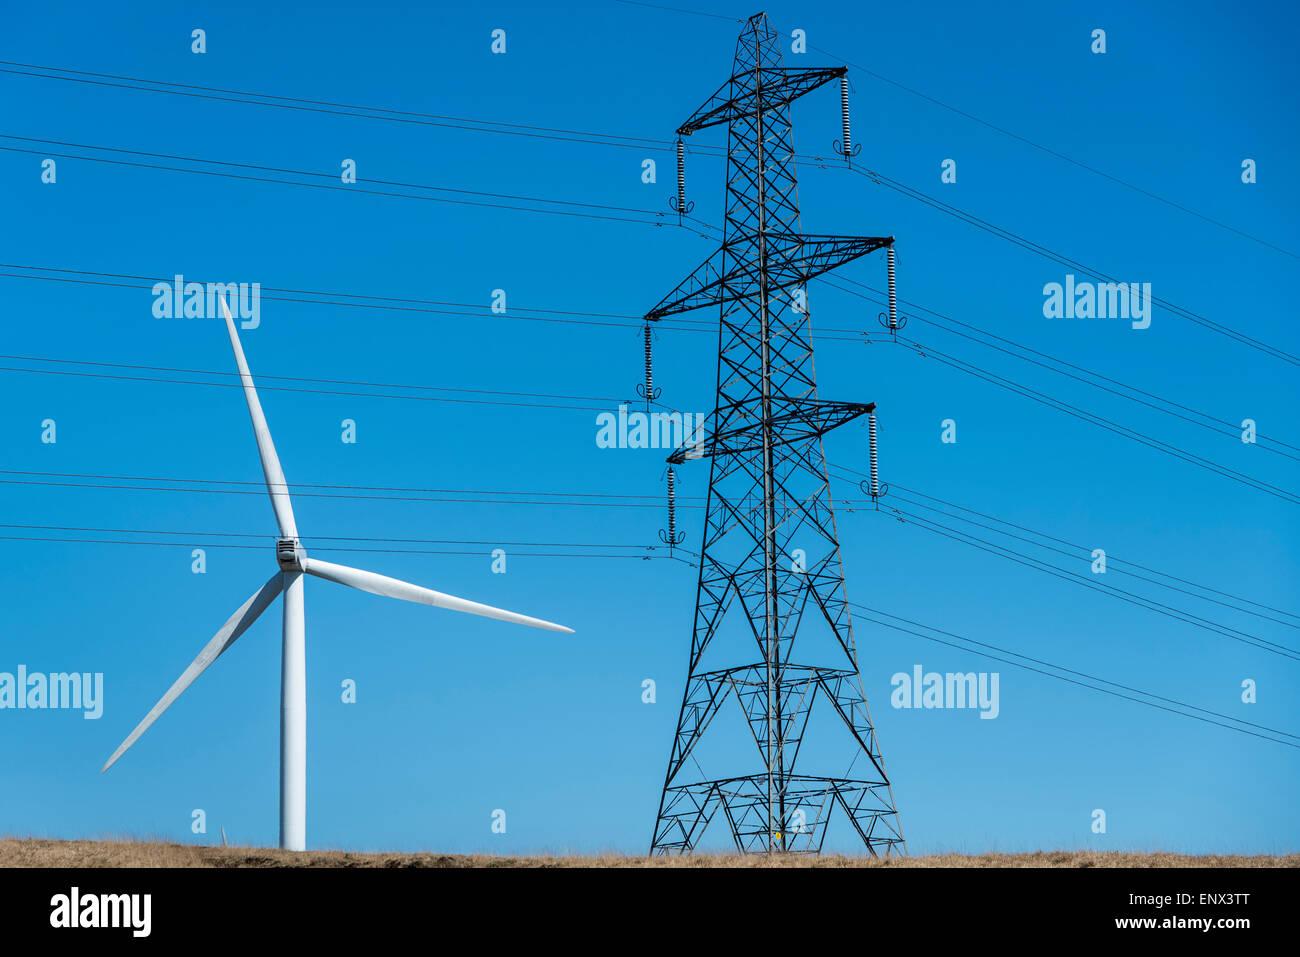 Grüne Energie Wind angetriebene Turbine Strom Pylon Klima Änderung globale Erwärmung Wind Windmühle Stockbild